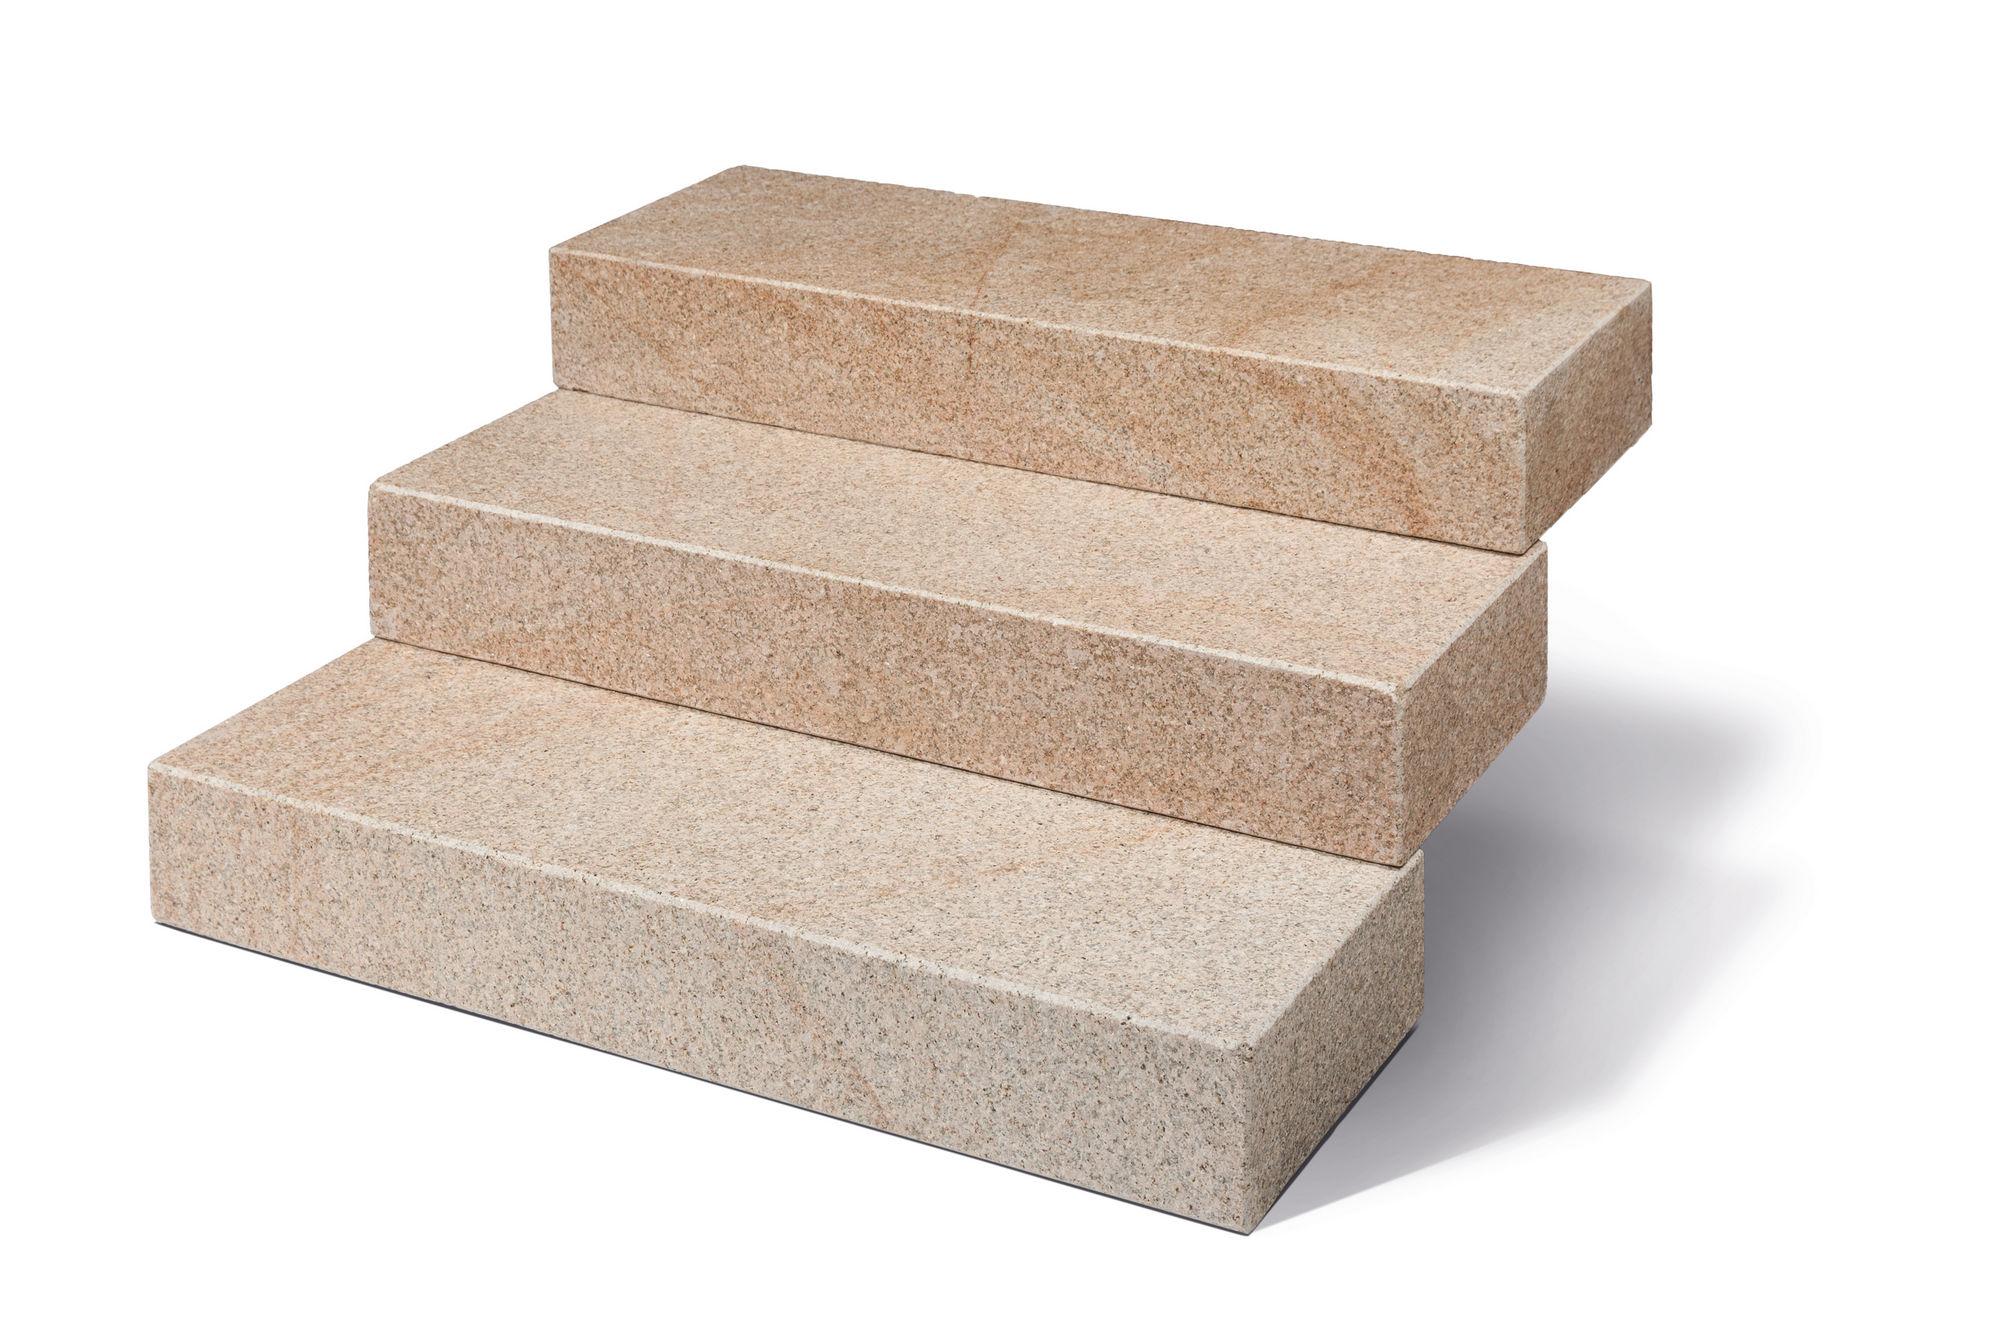 blockstufen granit rot gelb geflammt naturstein baumaterial. Black Bedroom Furniture Sets. Home Design Ideas